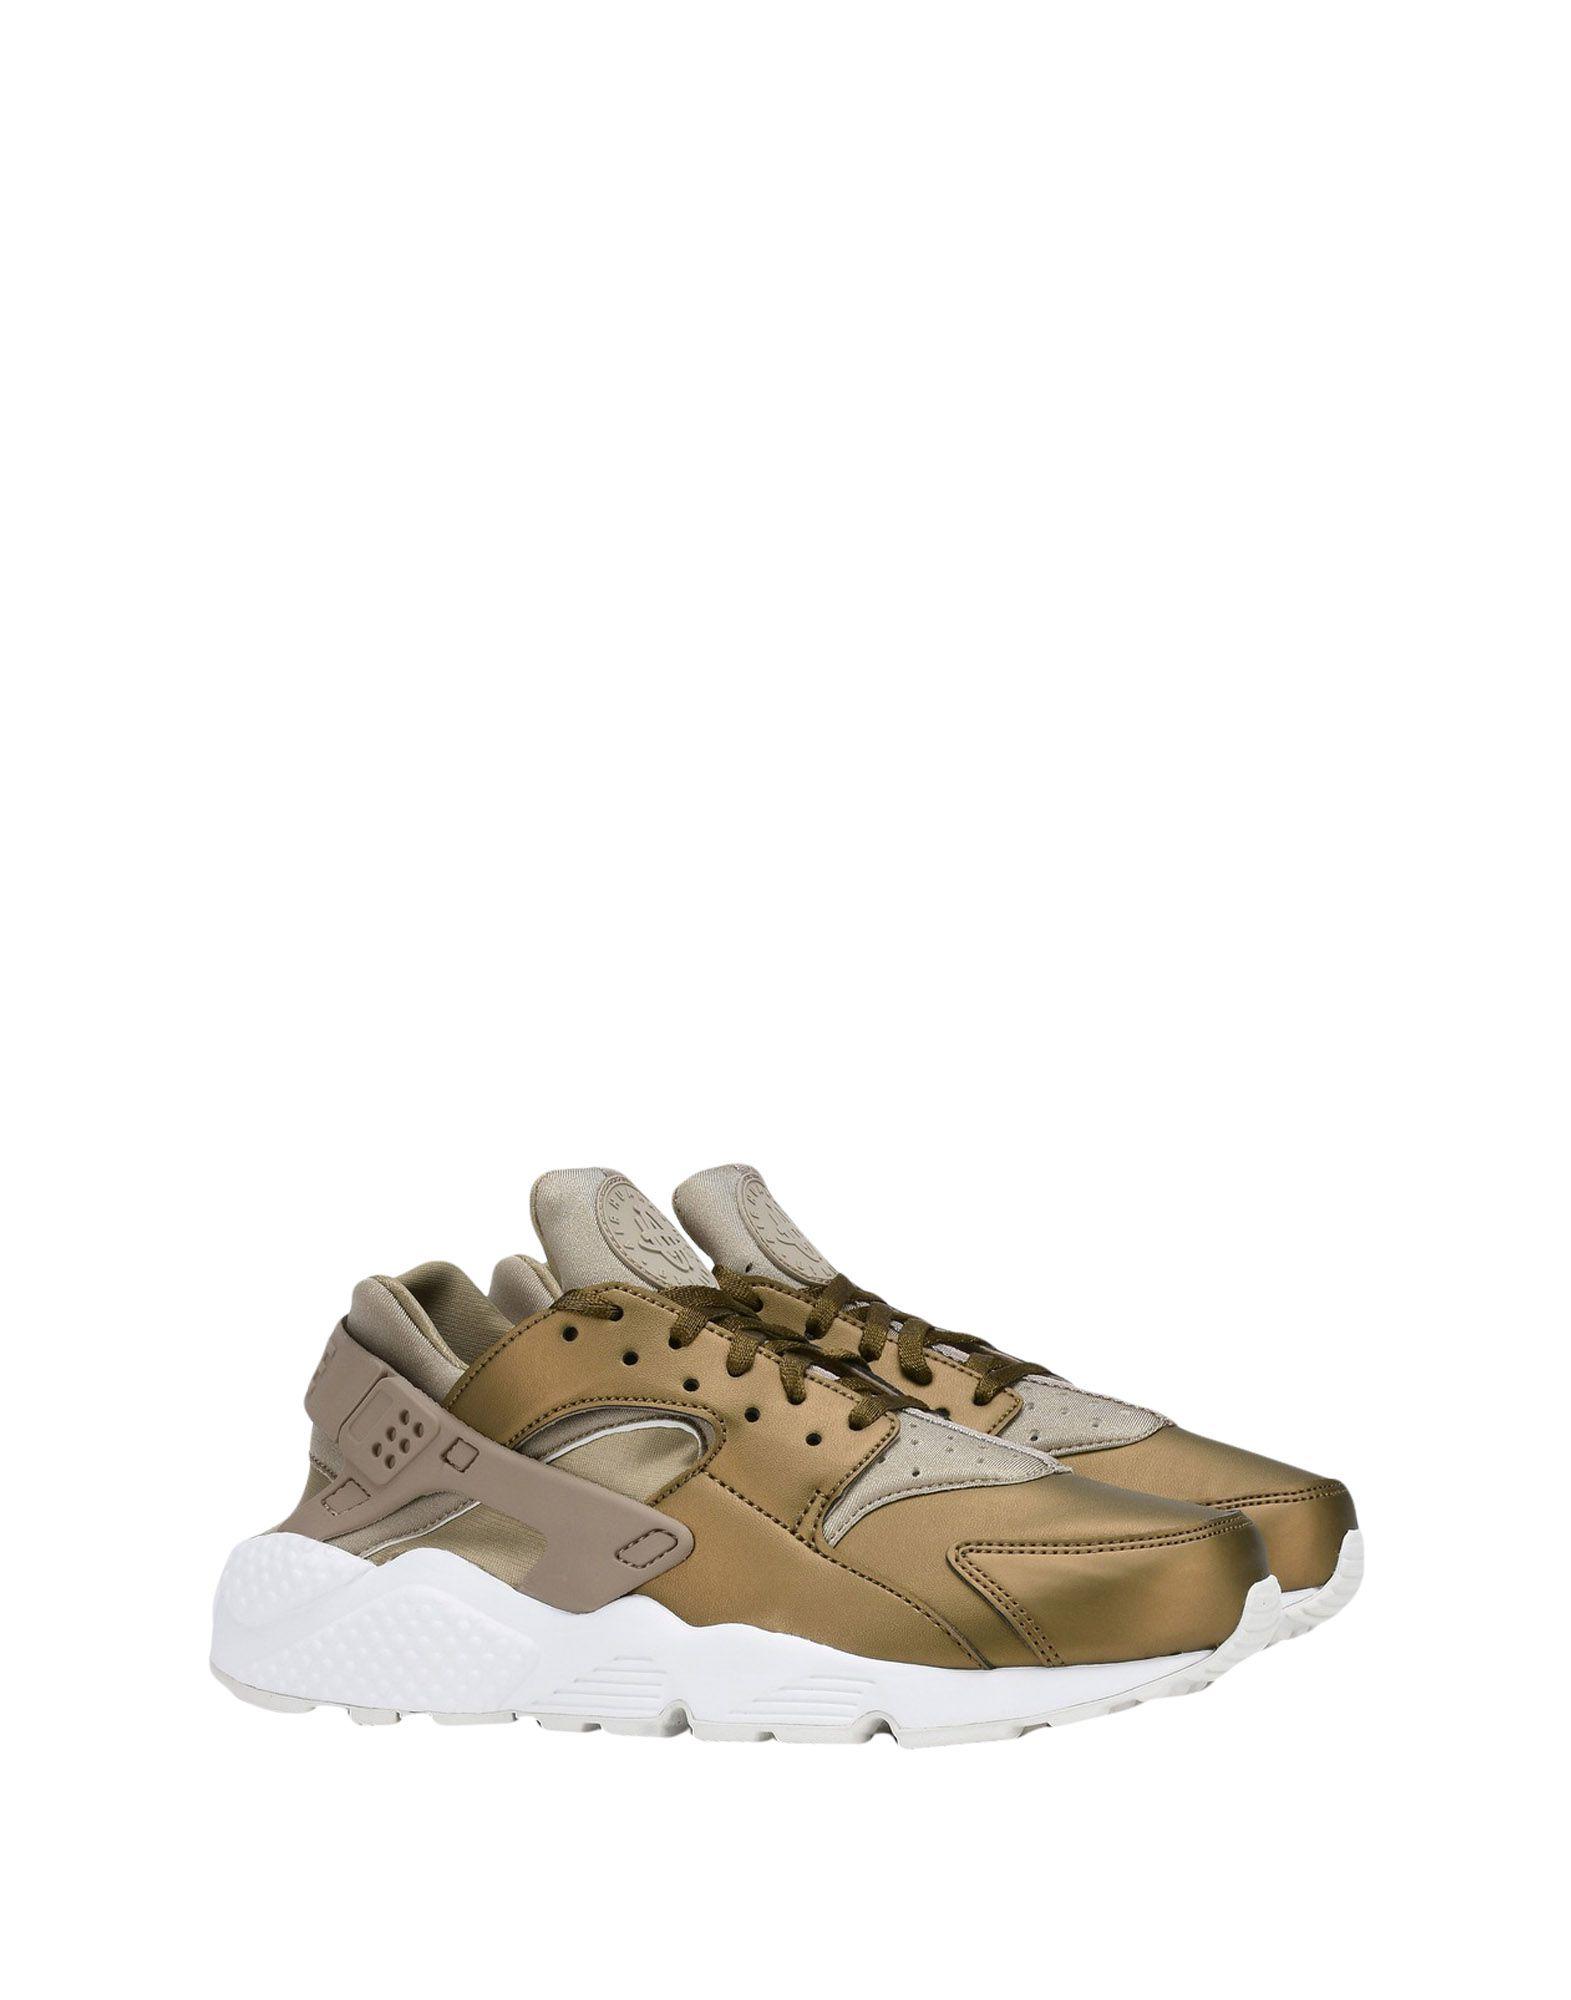 Sneakers Nike Wmns Air Huarache Run Prm Txt - Femme - Sneakers Nike sur